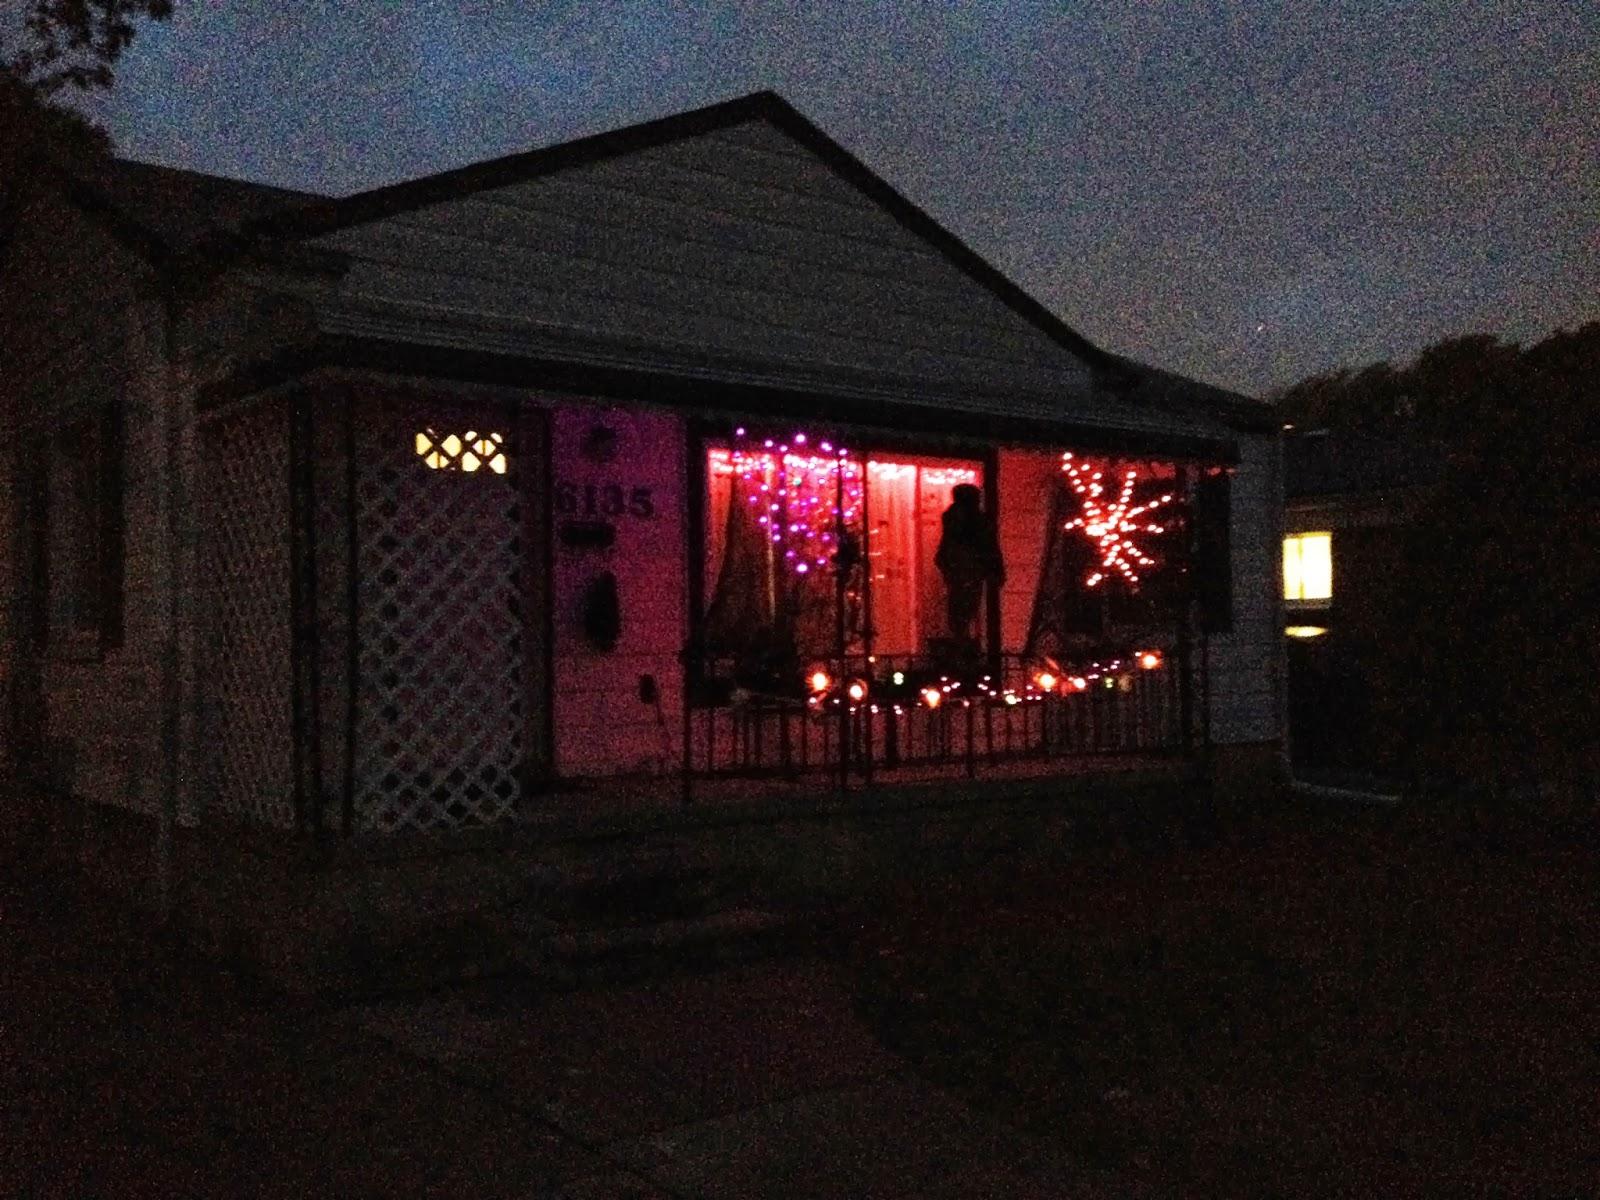 warrendale (detroit) blog: halloween decorations in warrendale